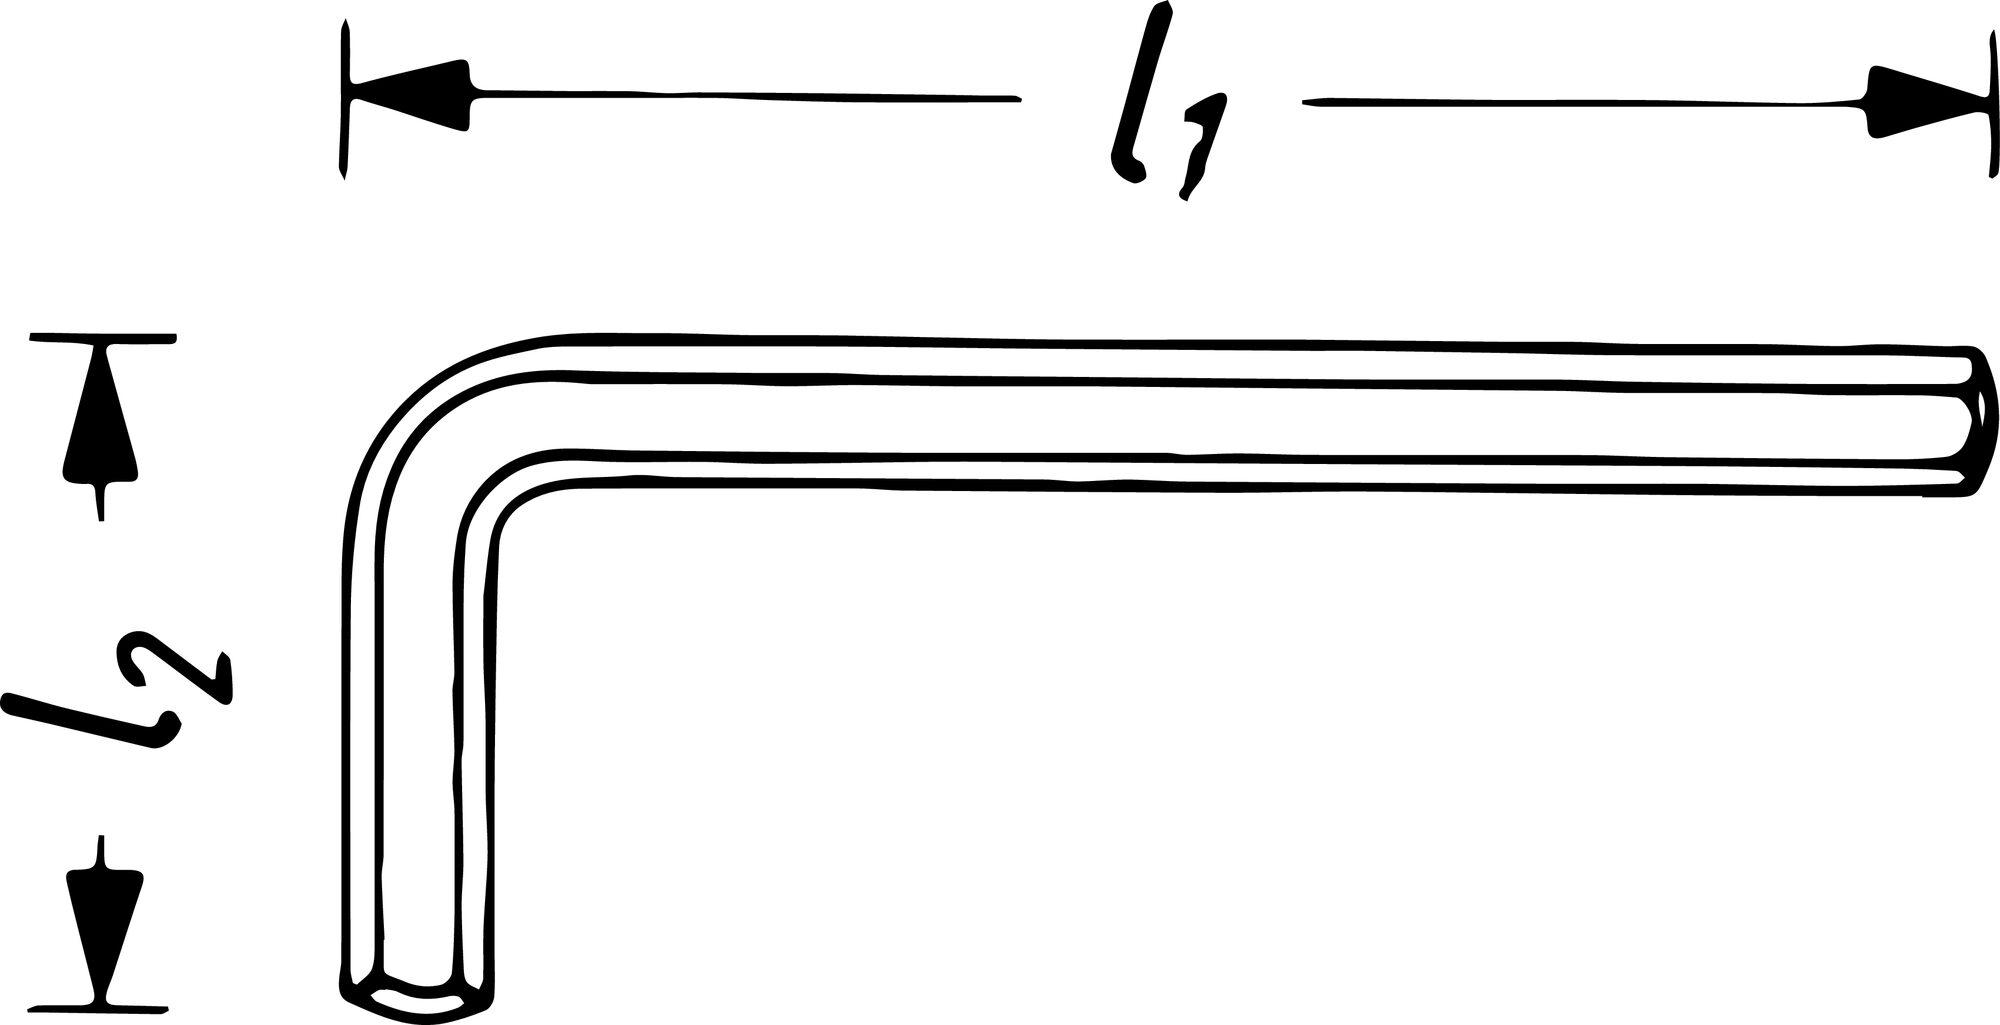 HAZET Winkelschraubendreher 2100A-1/4 ∙ Innen-Sechskant Profil ∙ 1⁄4 ″